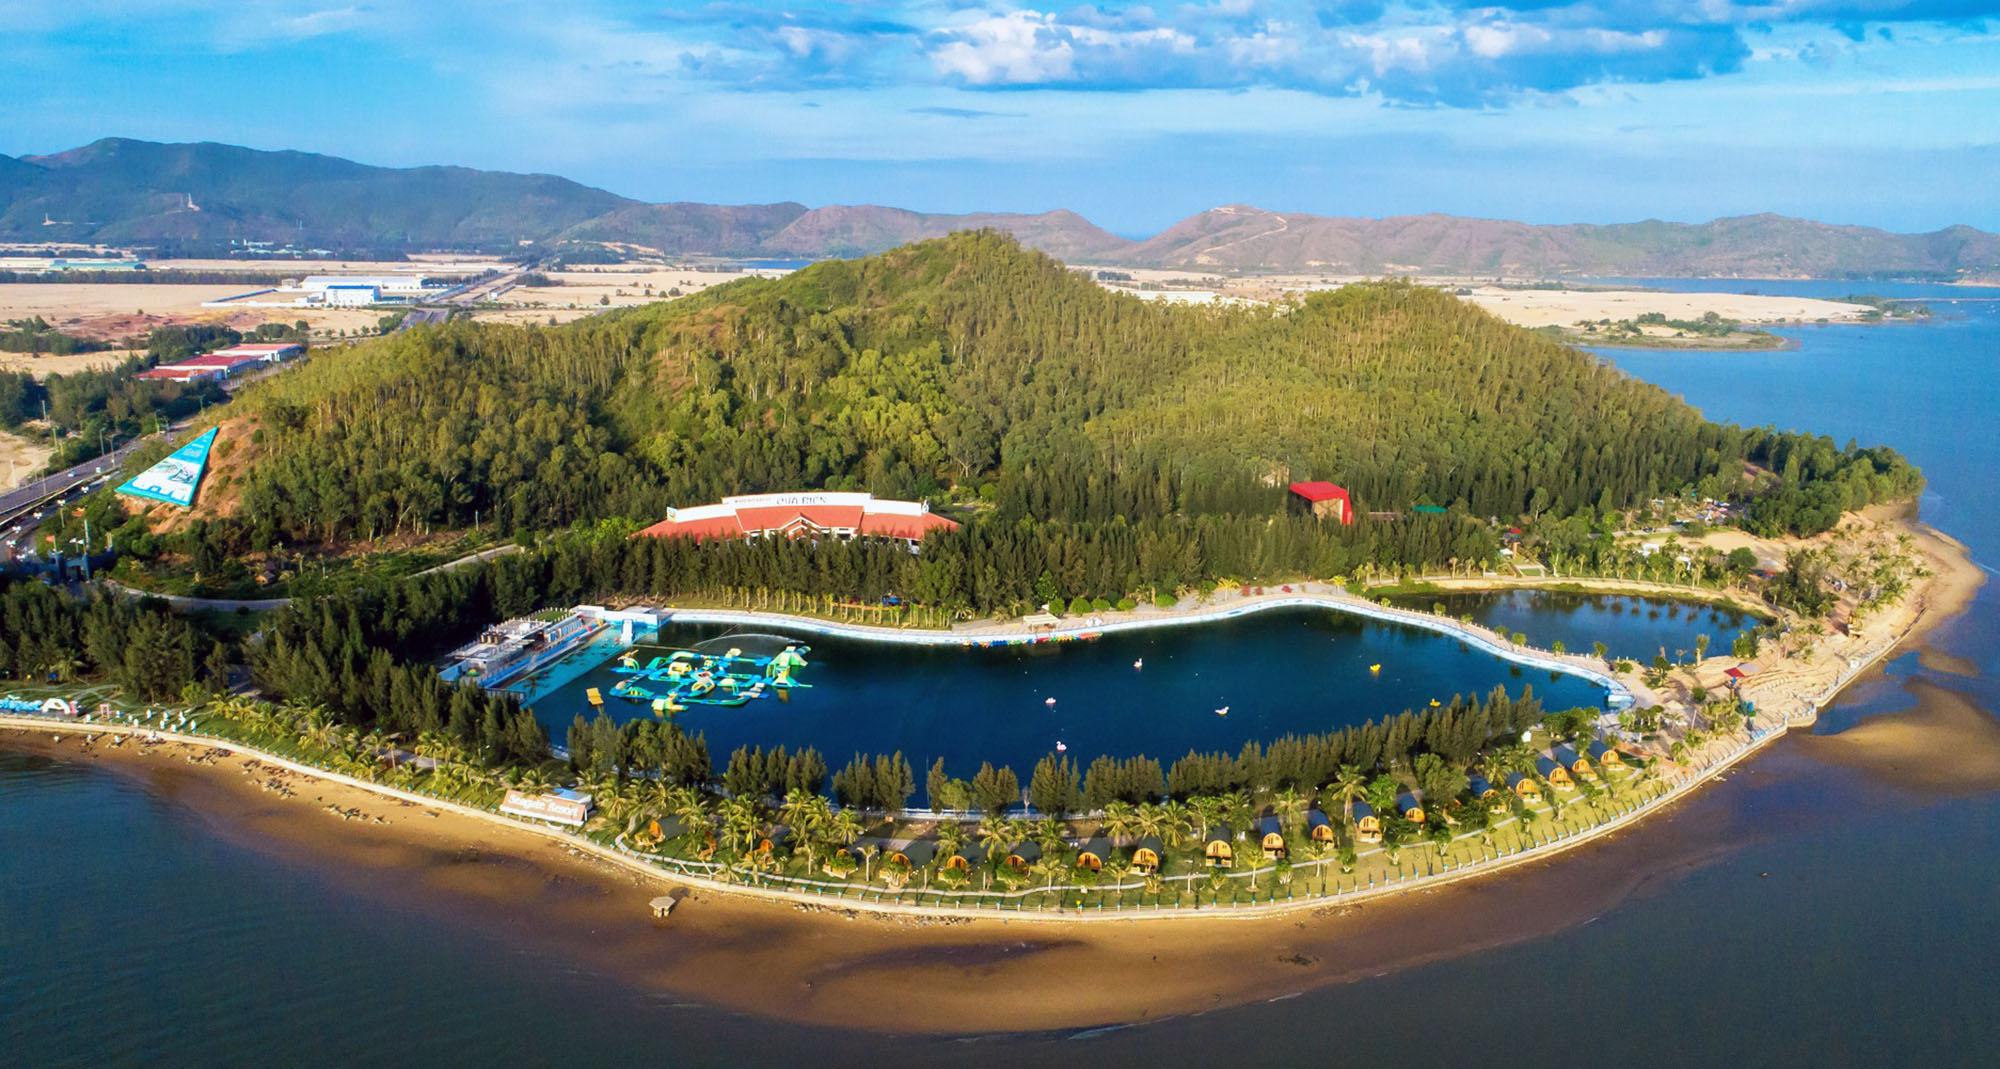 Located on the north bank of Thi Nai Bridge, the resort